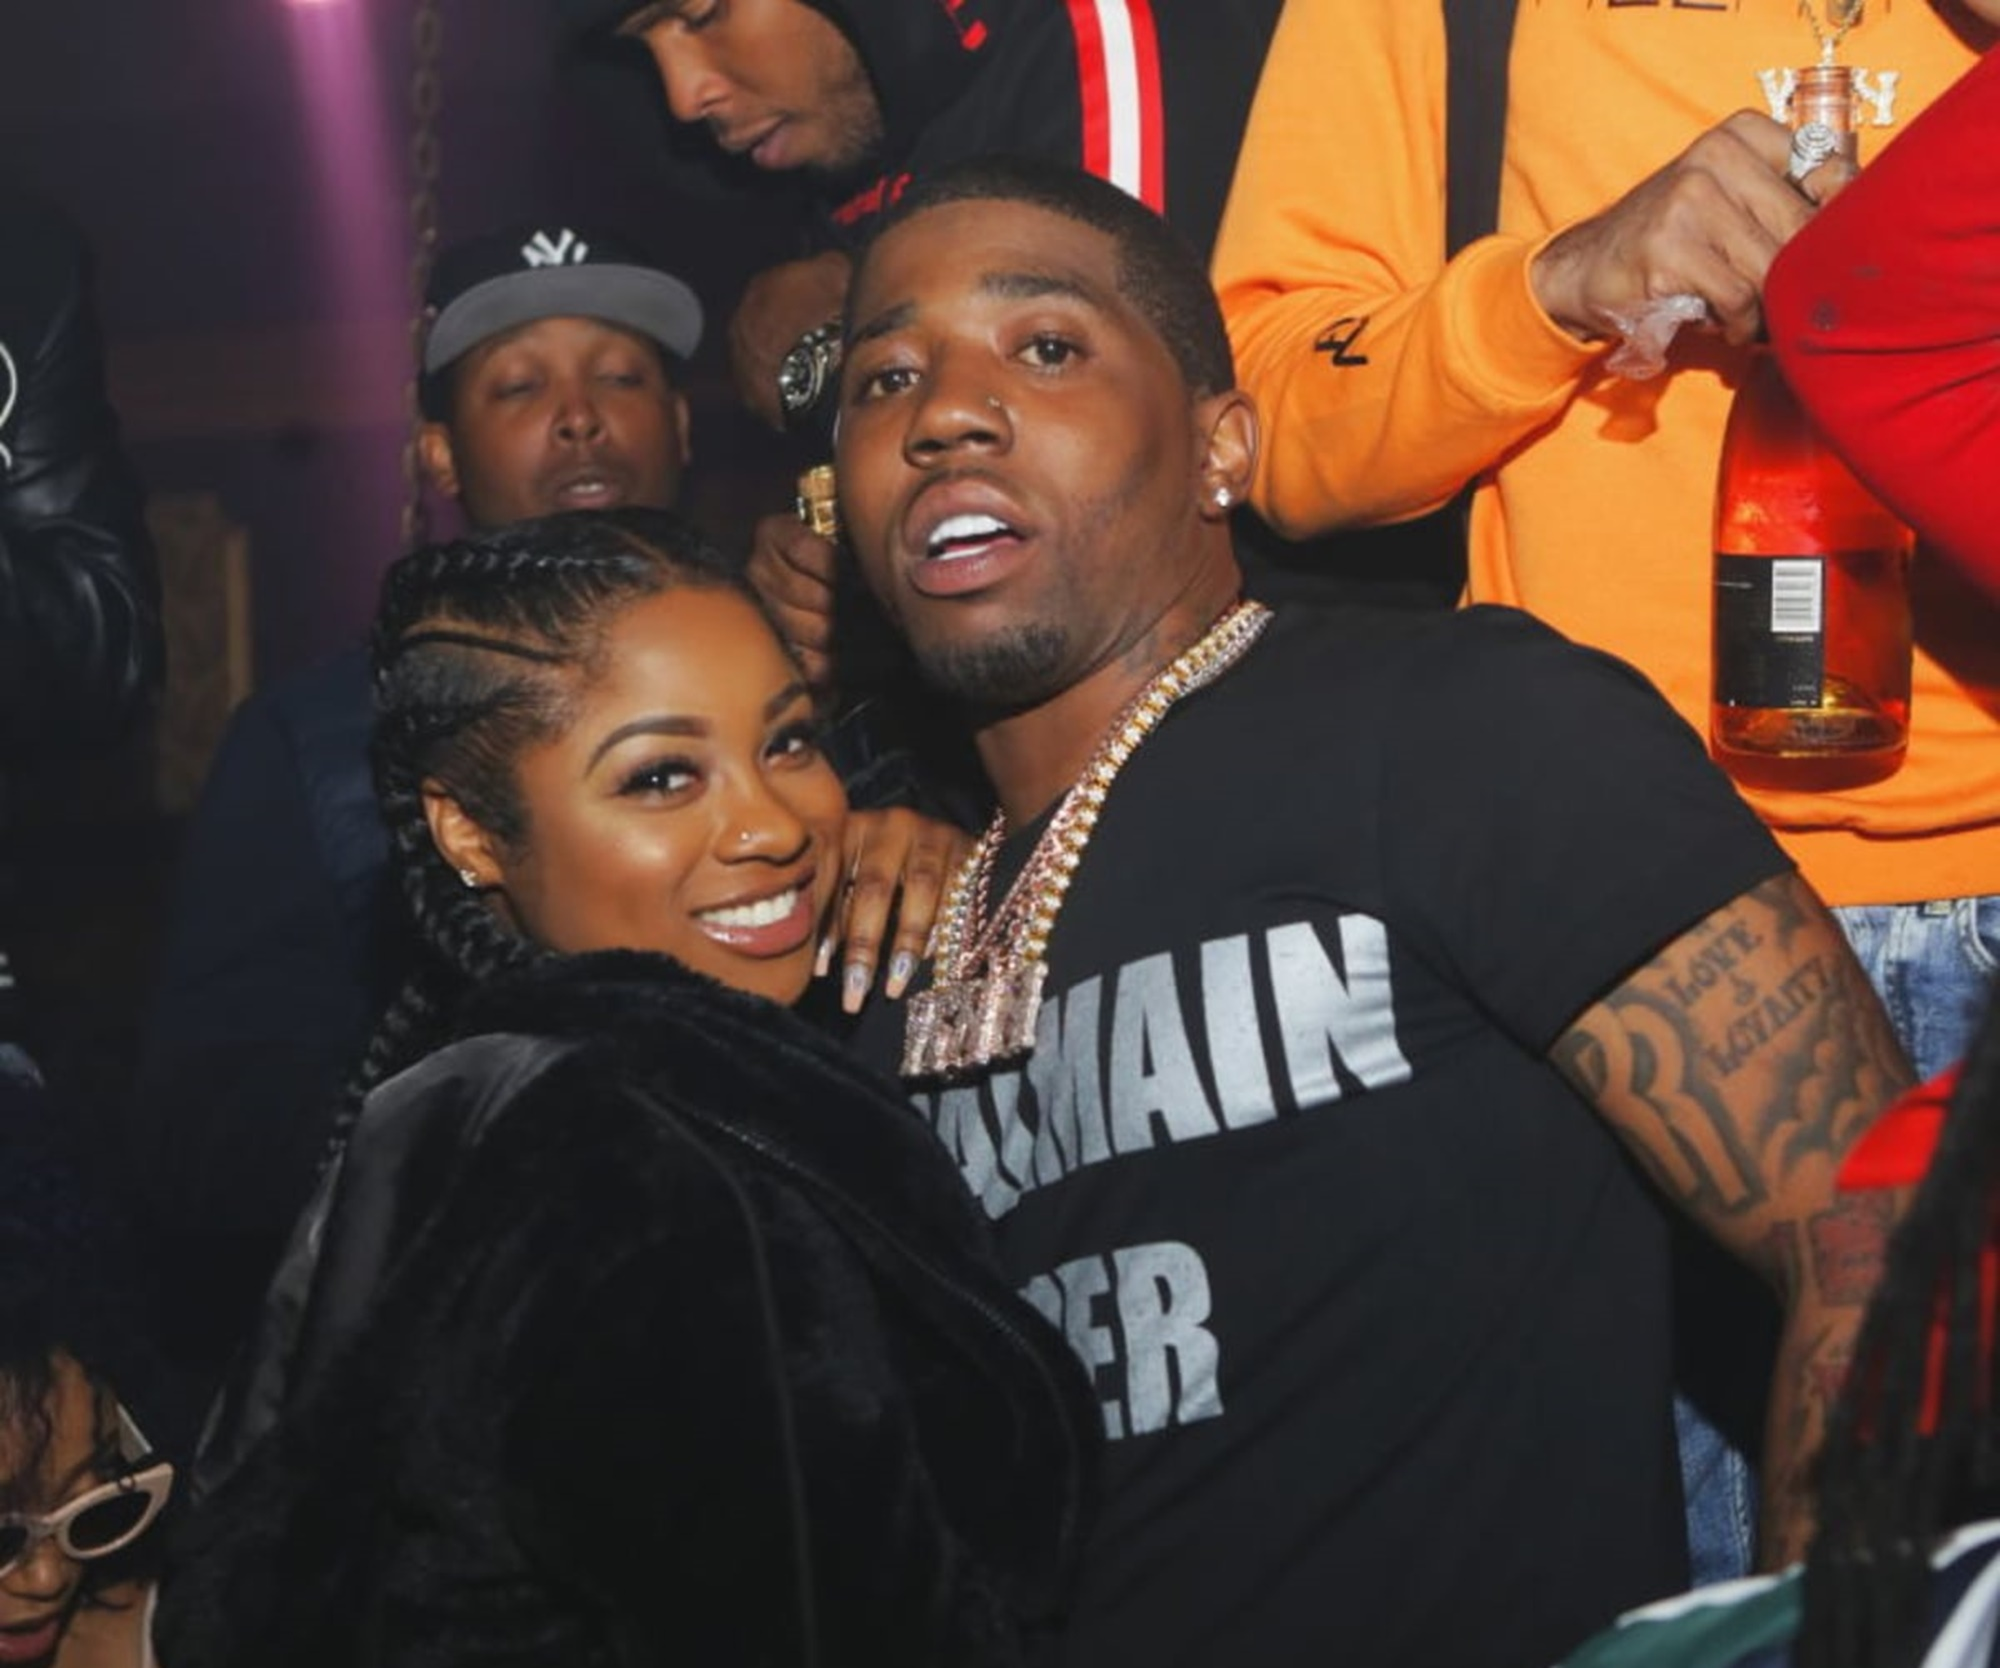 Reginae Carter YFN Lucci Lil Wayne